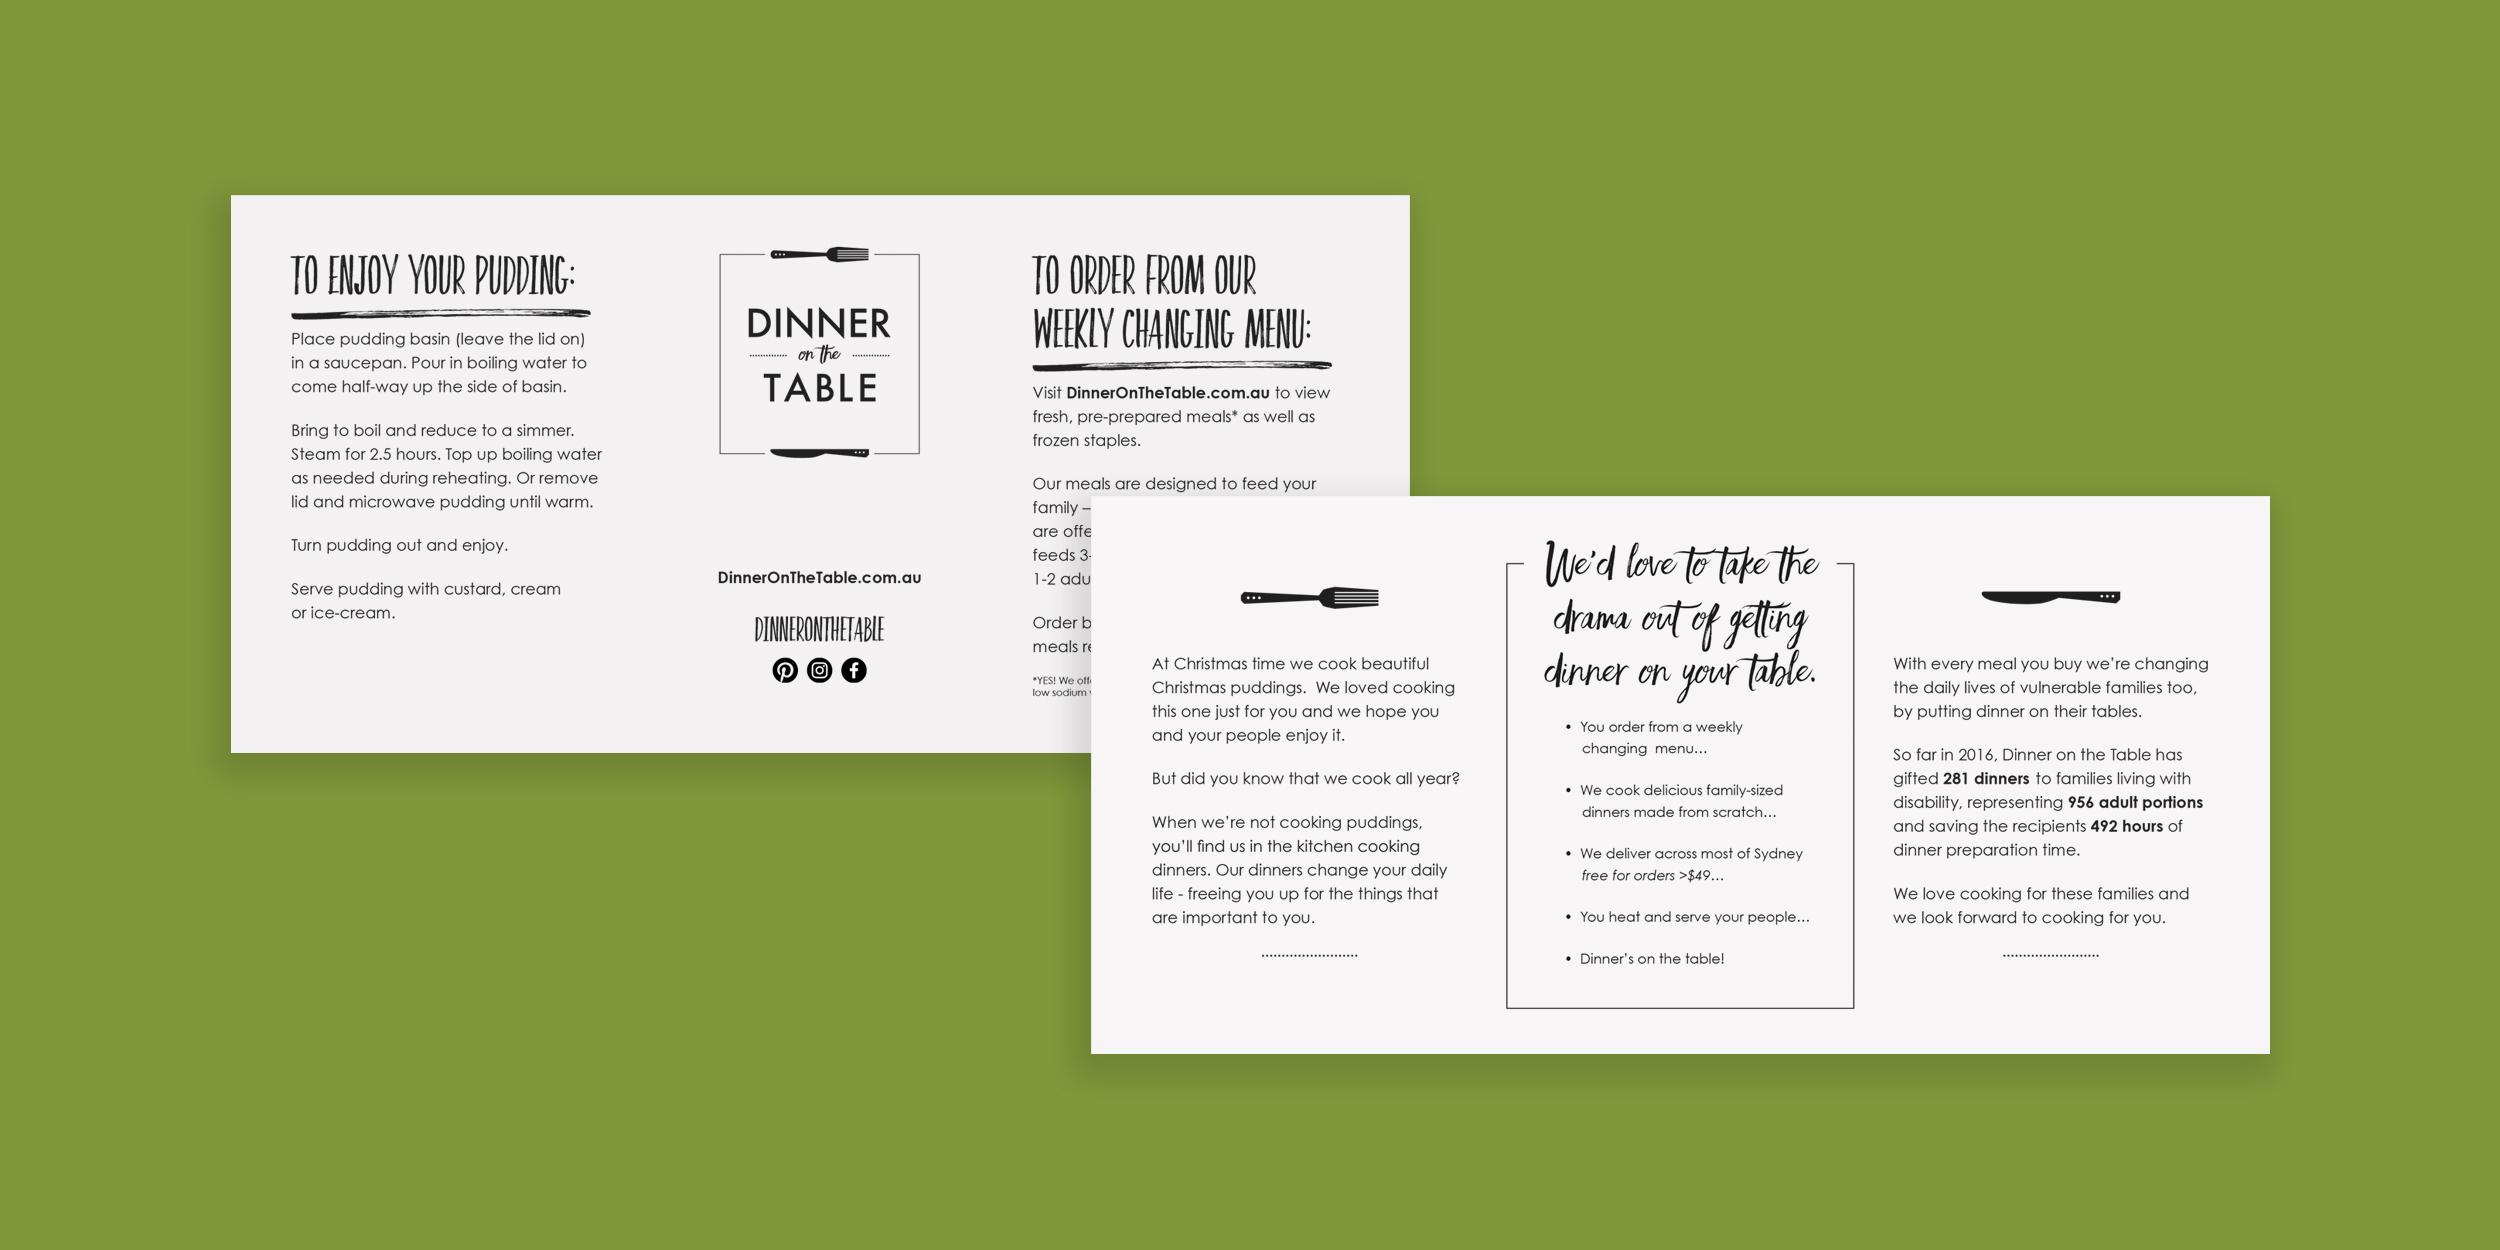 DinnerOnTheTable-DL-Flyer-ANJ-green.jpg